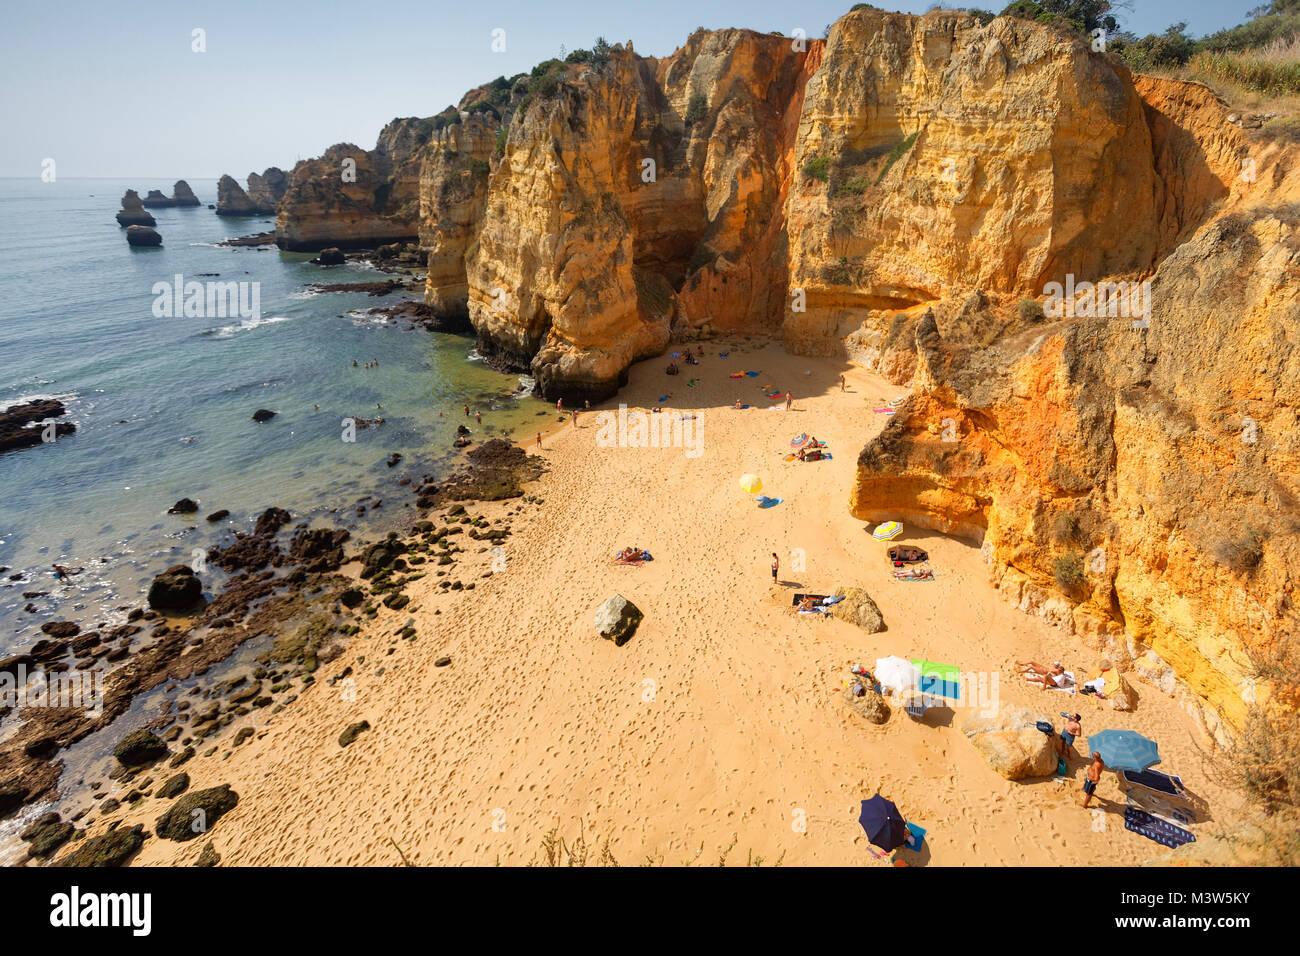 Portugal algarve near Lagos , Praia Dona Ana Atlantik coast - Stock Image